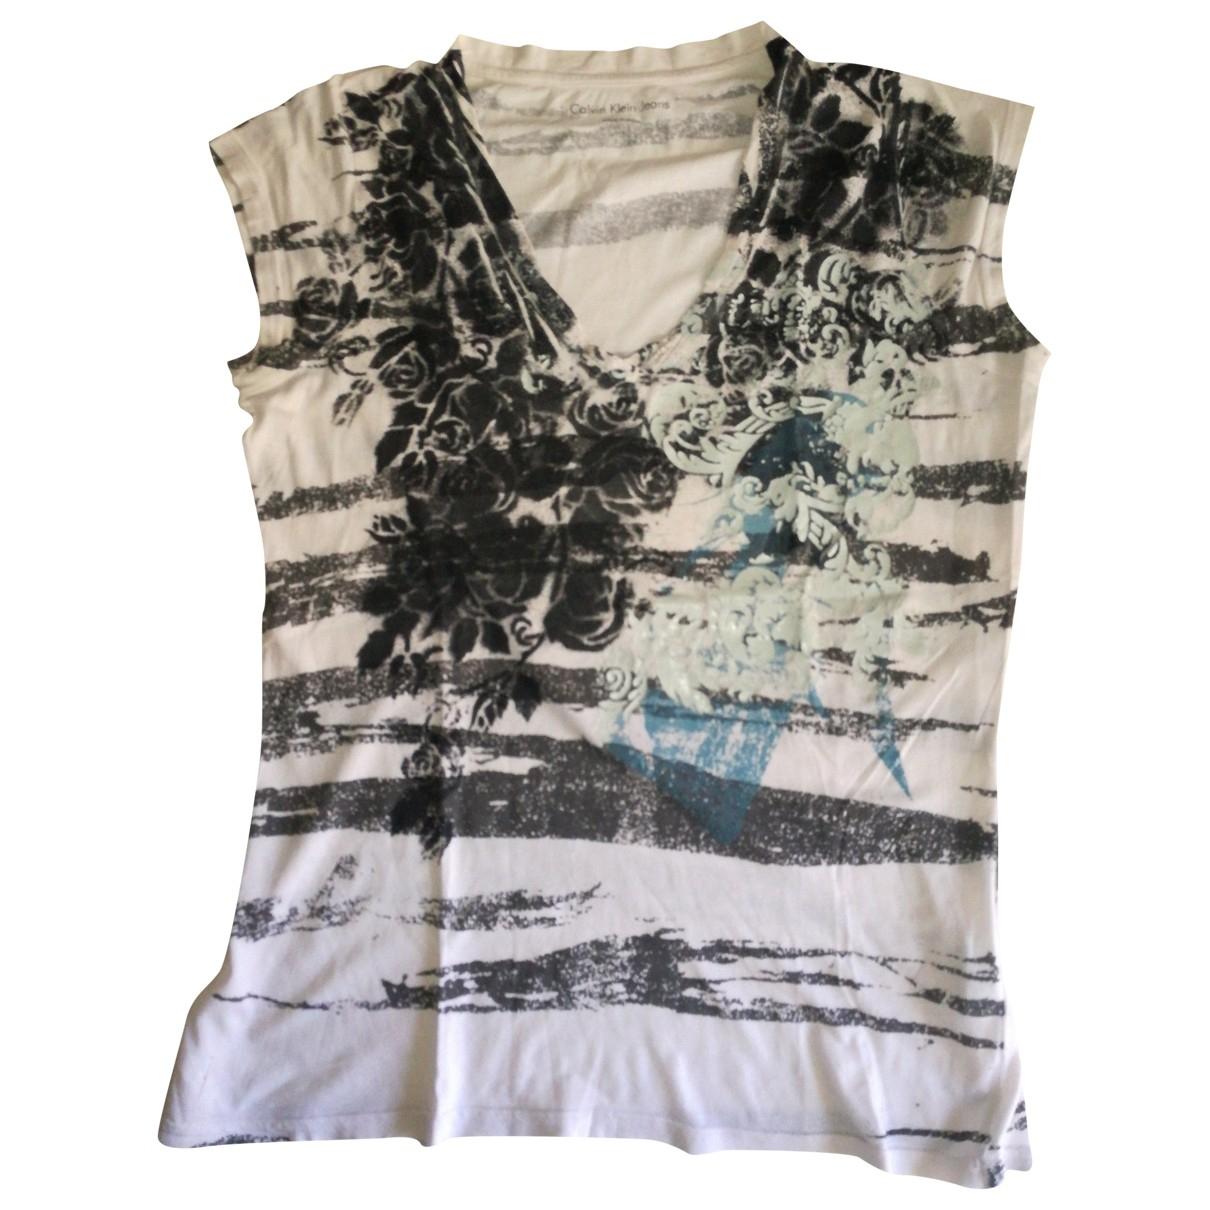 Camiseta sin mangas Calvin Klein